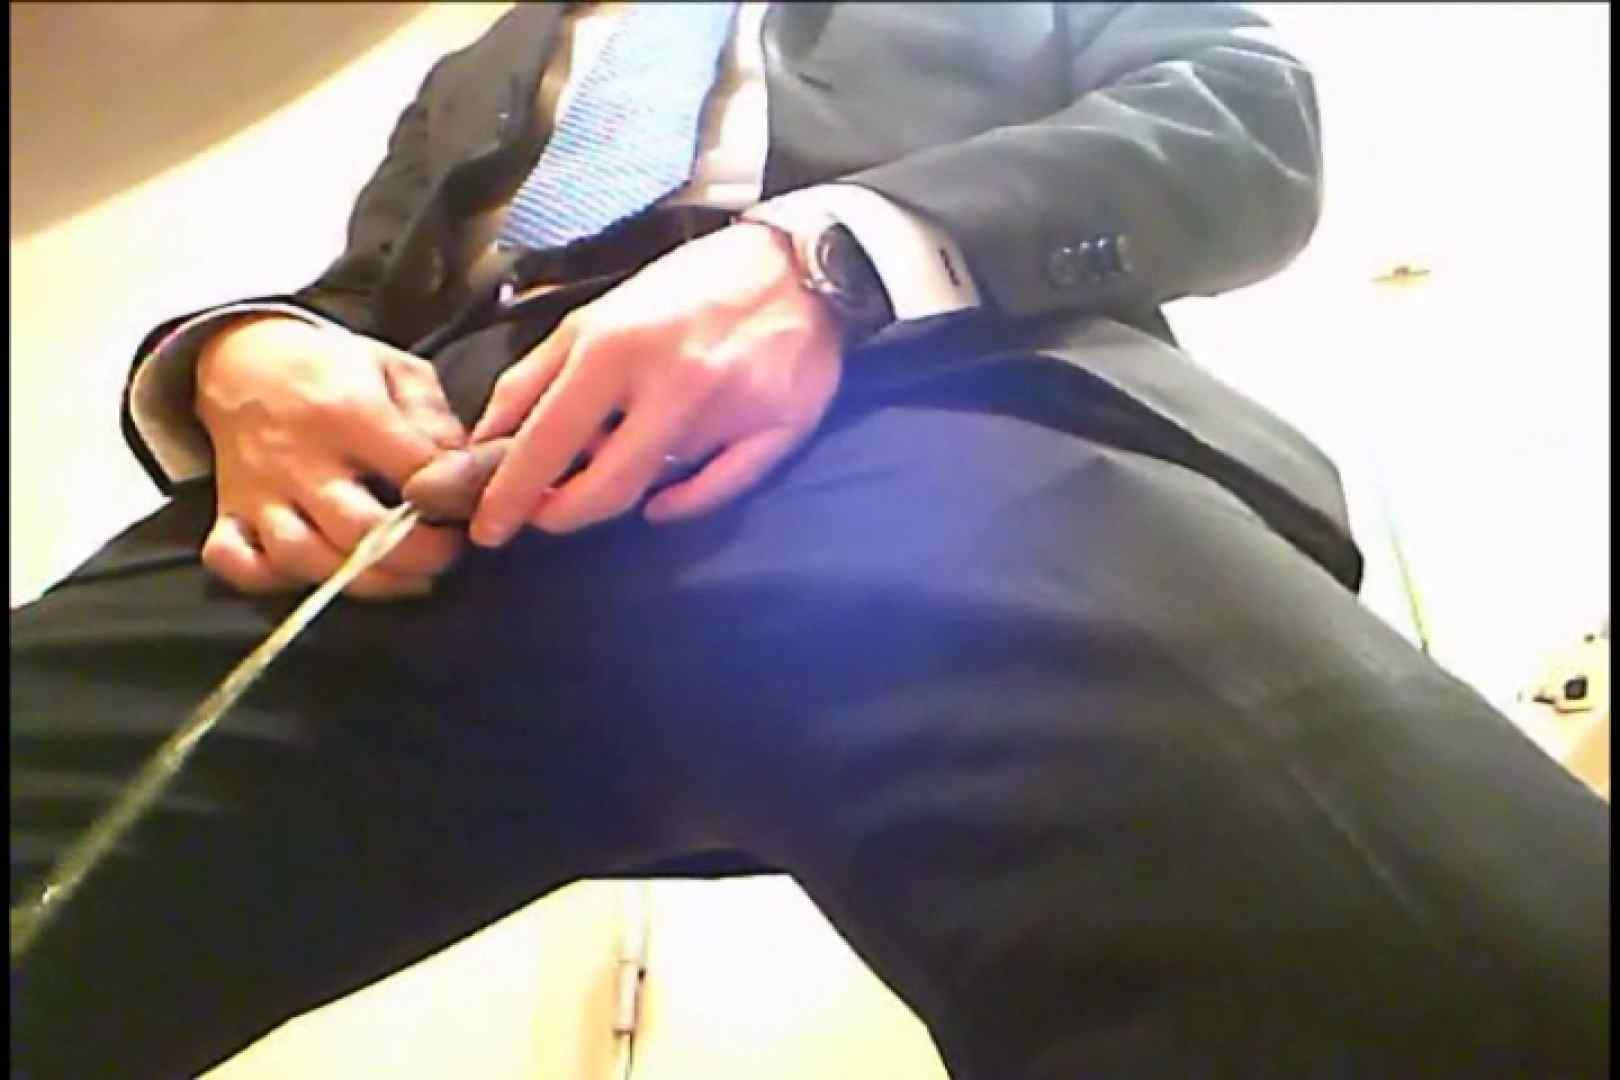 Gボーイ初投稿!掴み取りさんの洗面所覗き!in新幹線!VOL.05 覗きお宝 ゲイアダルトビデオ画像 63連発 19